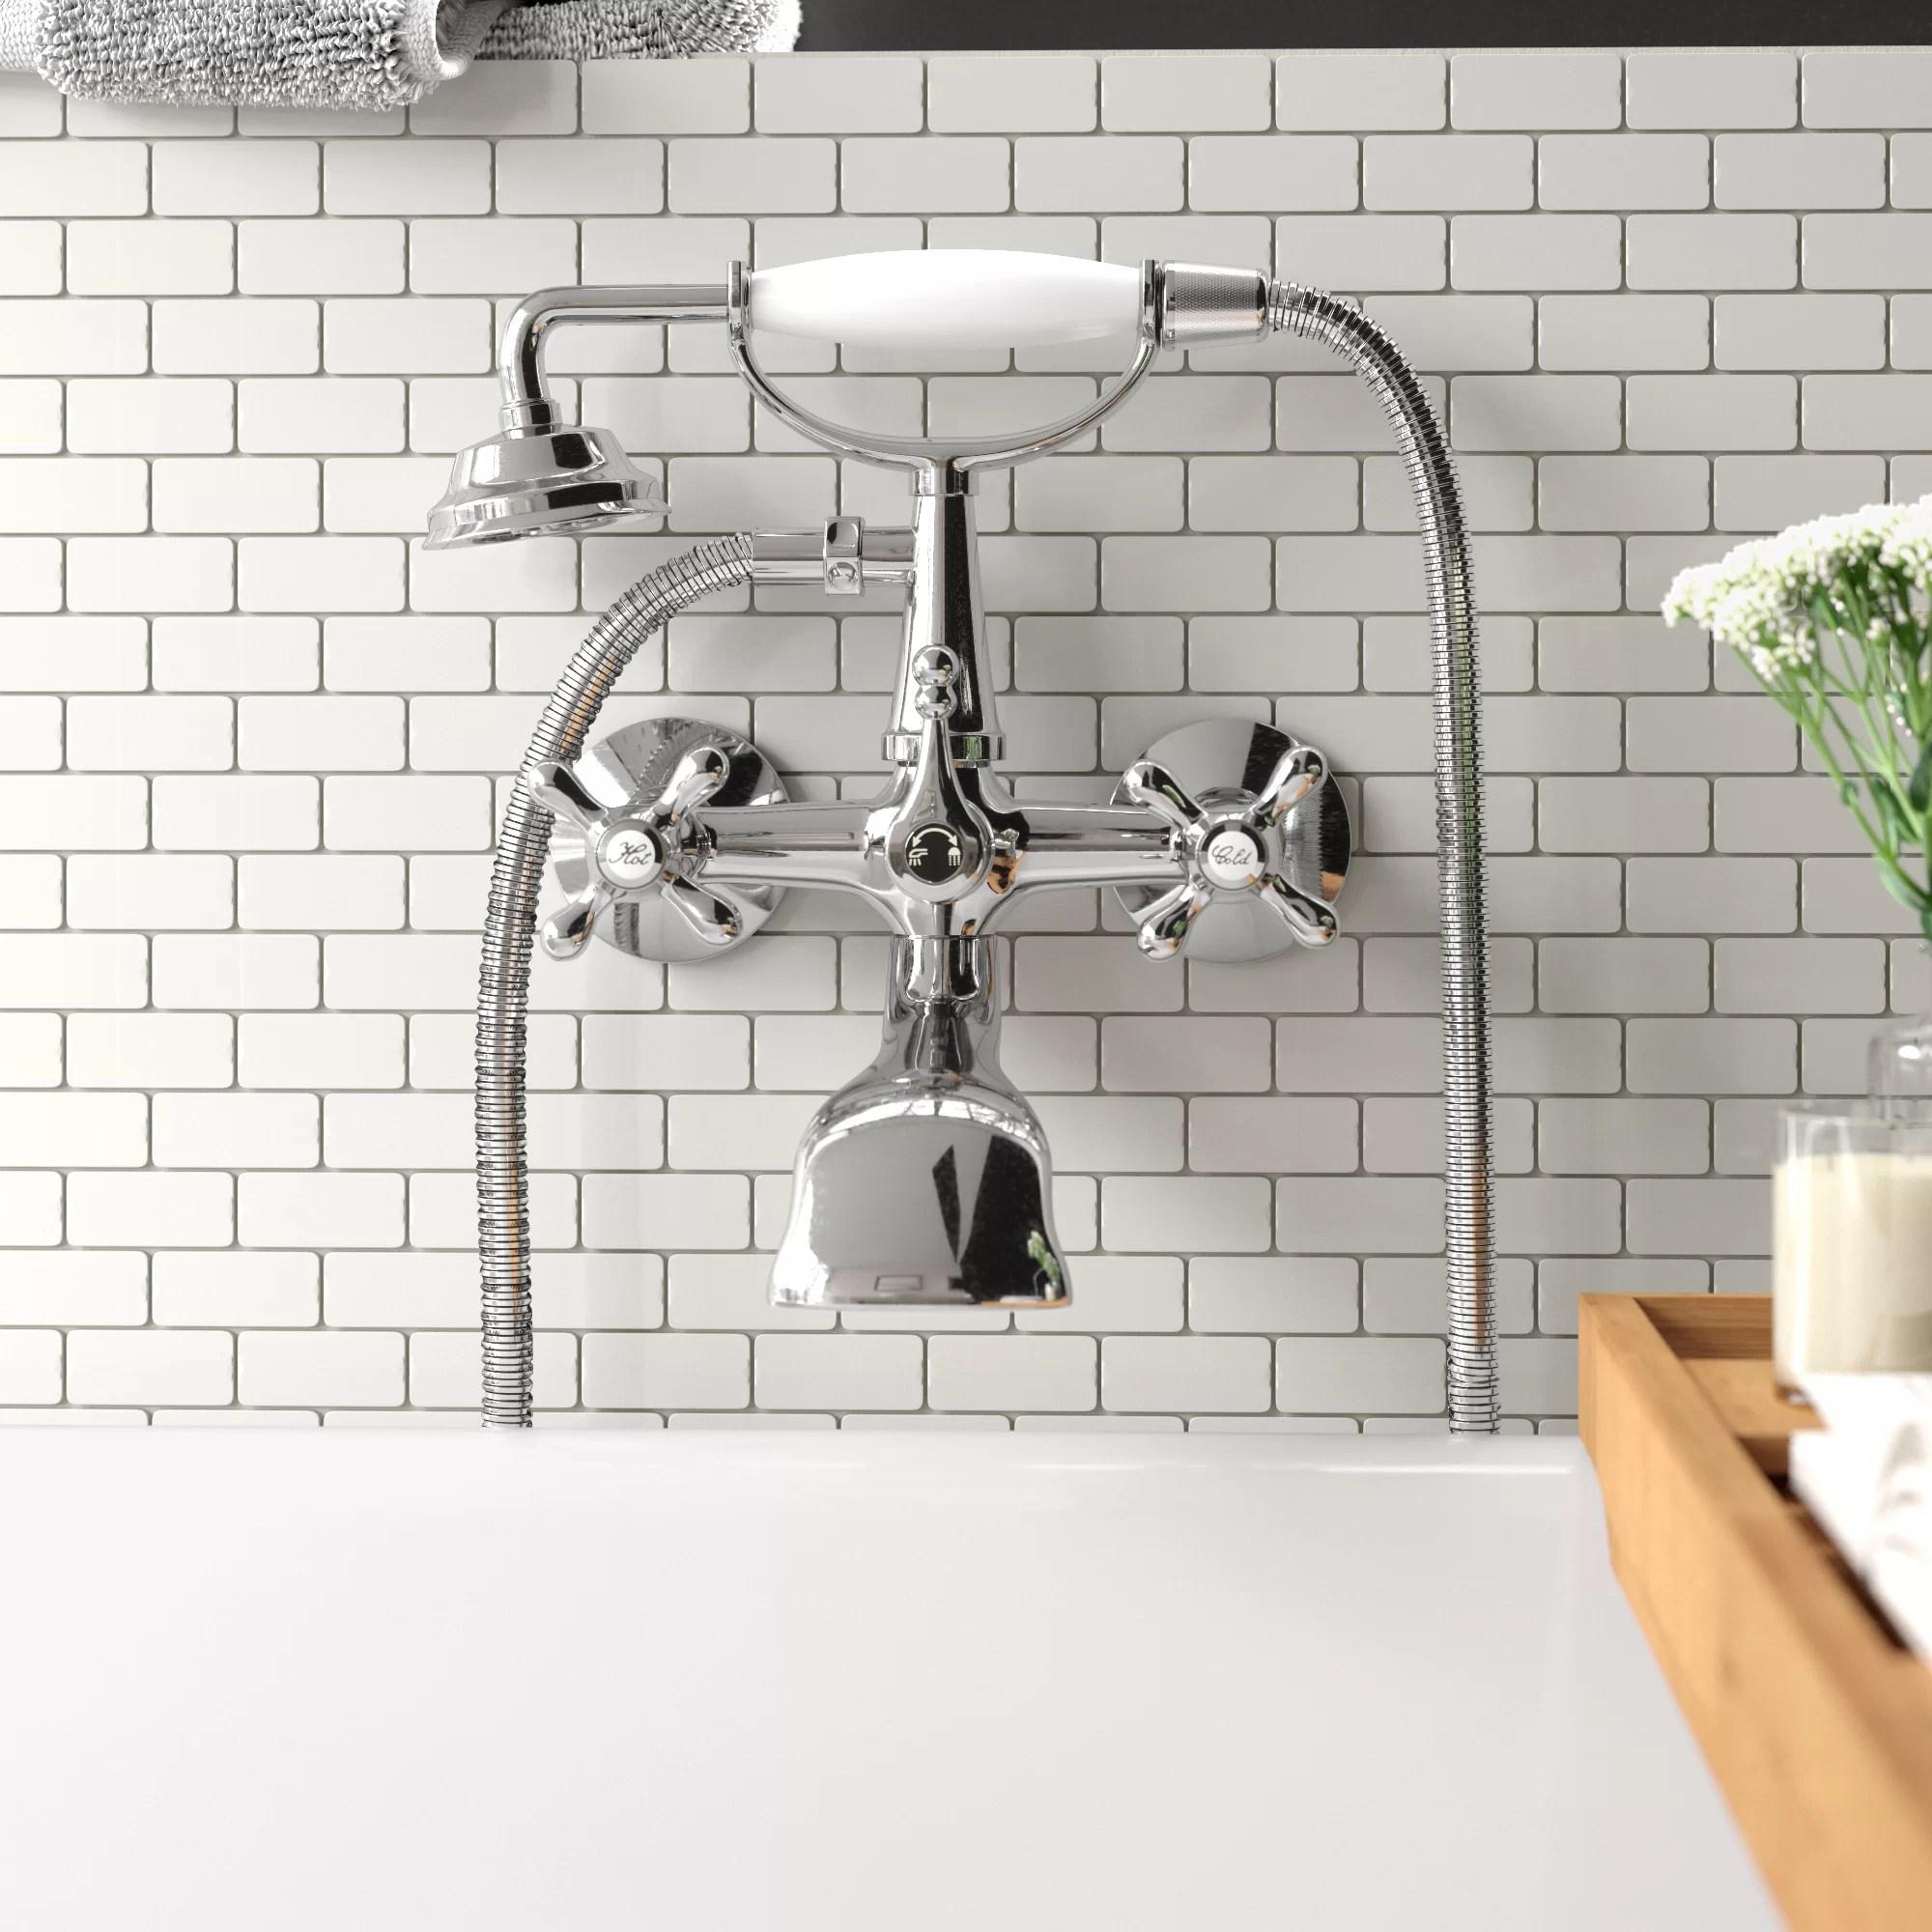 isai wall mounted clawfoot tub faucet